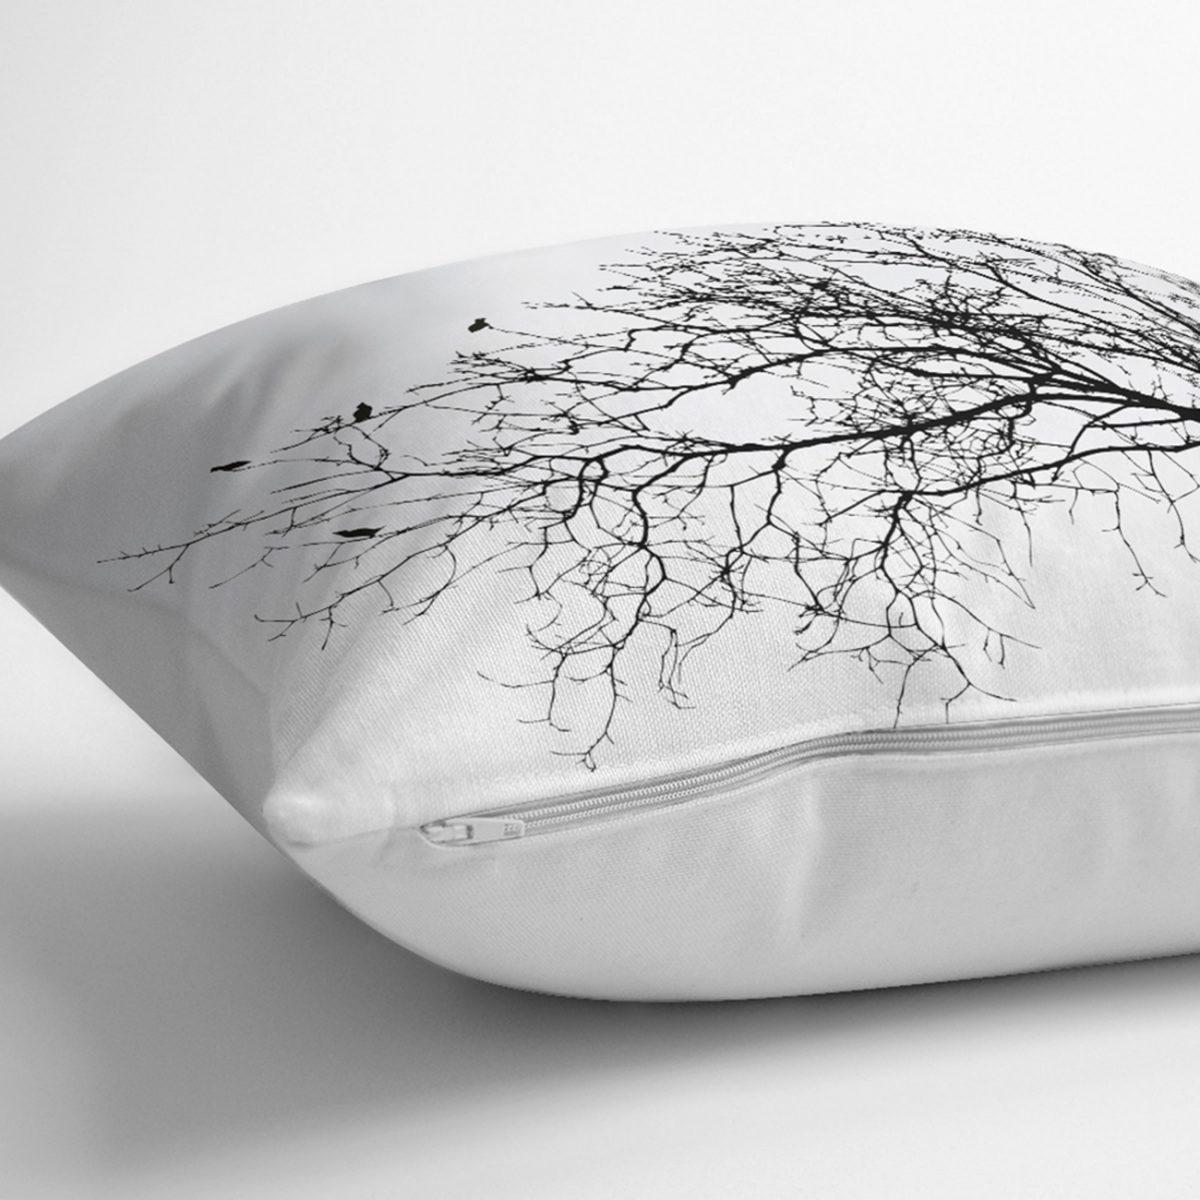 Realhomes Ağaç Dalı Kuş Tasarımlı Dijital Baskılı Kırlent Kılıfı Realhomes